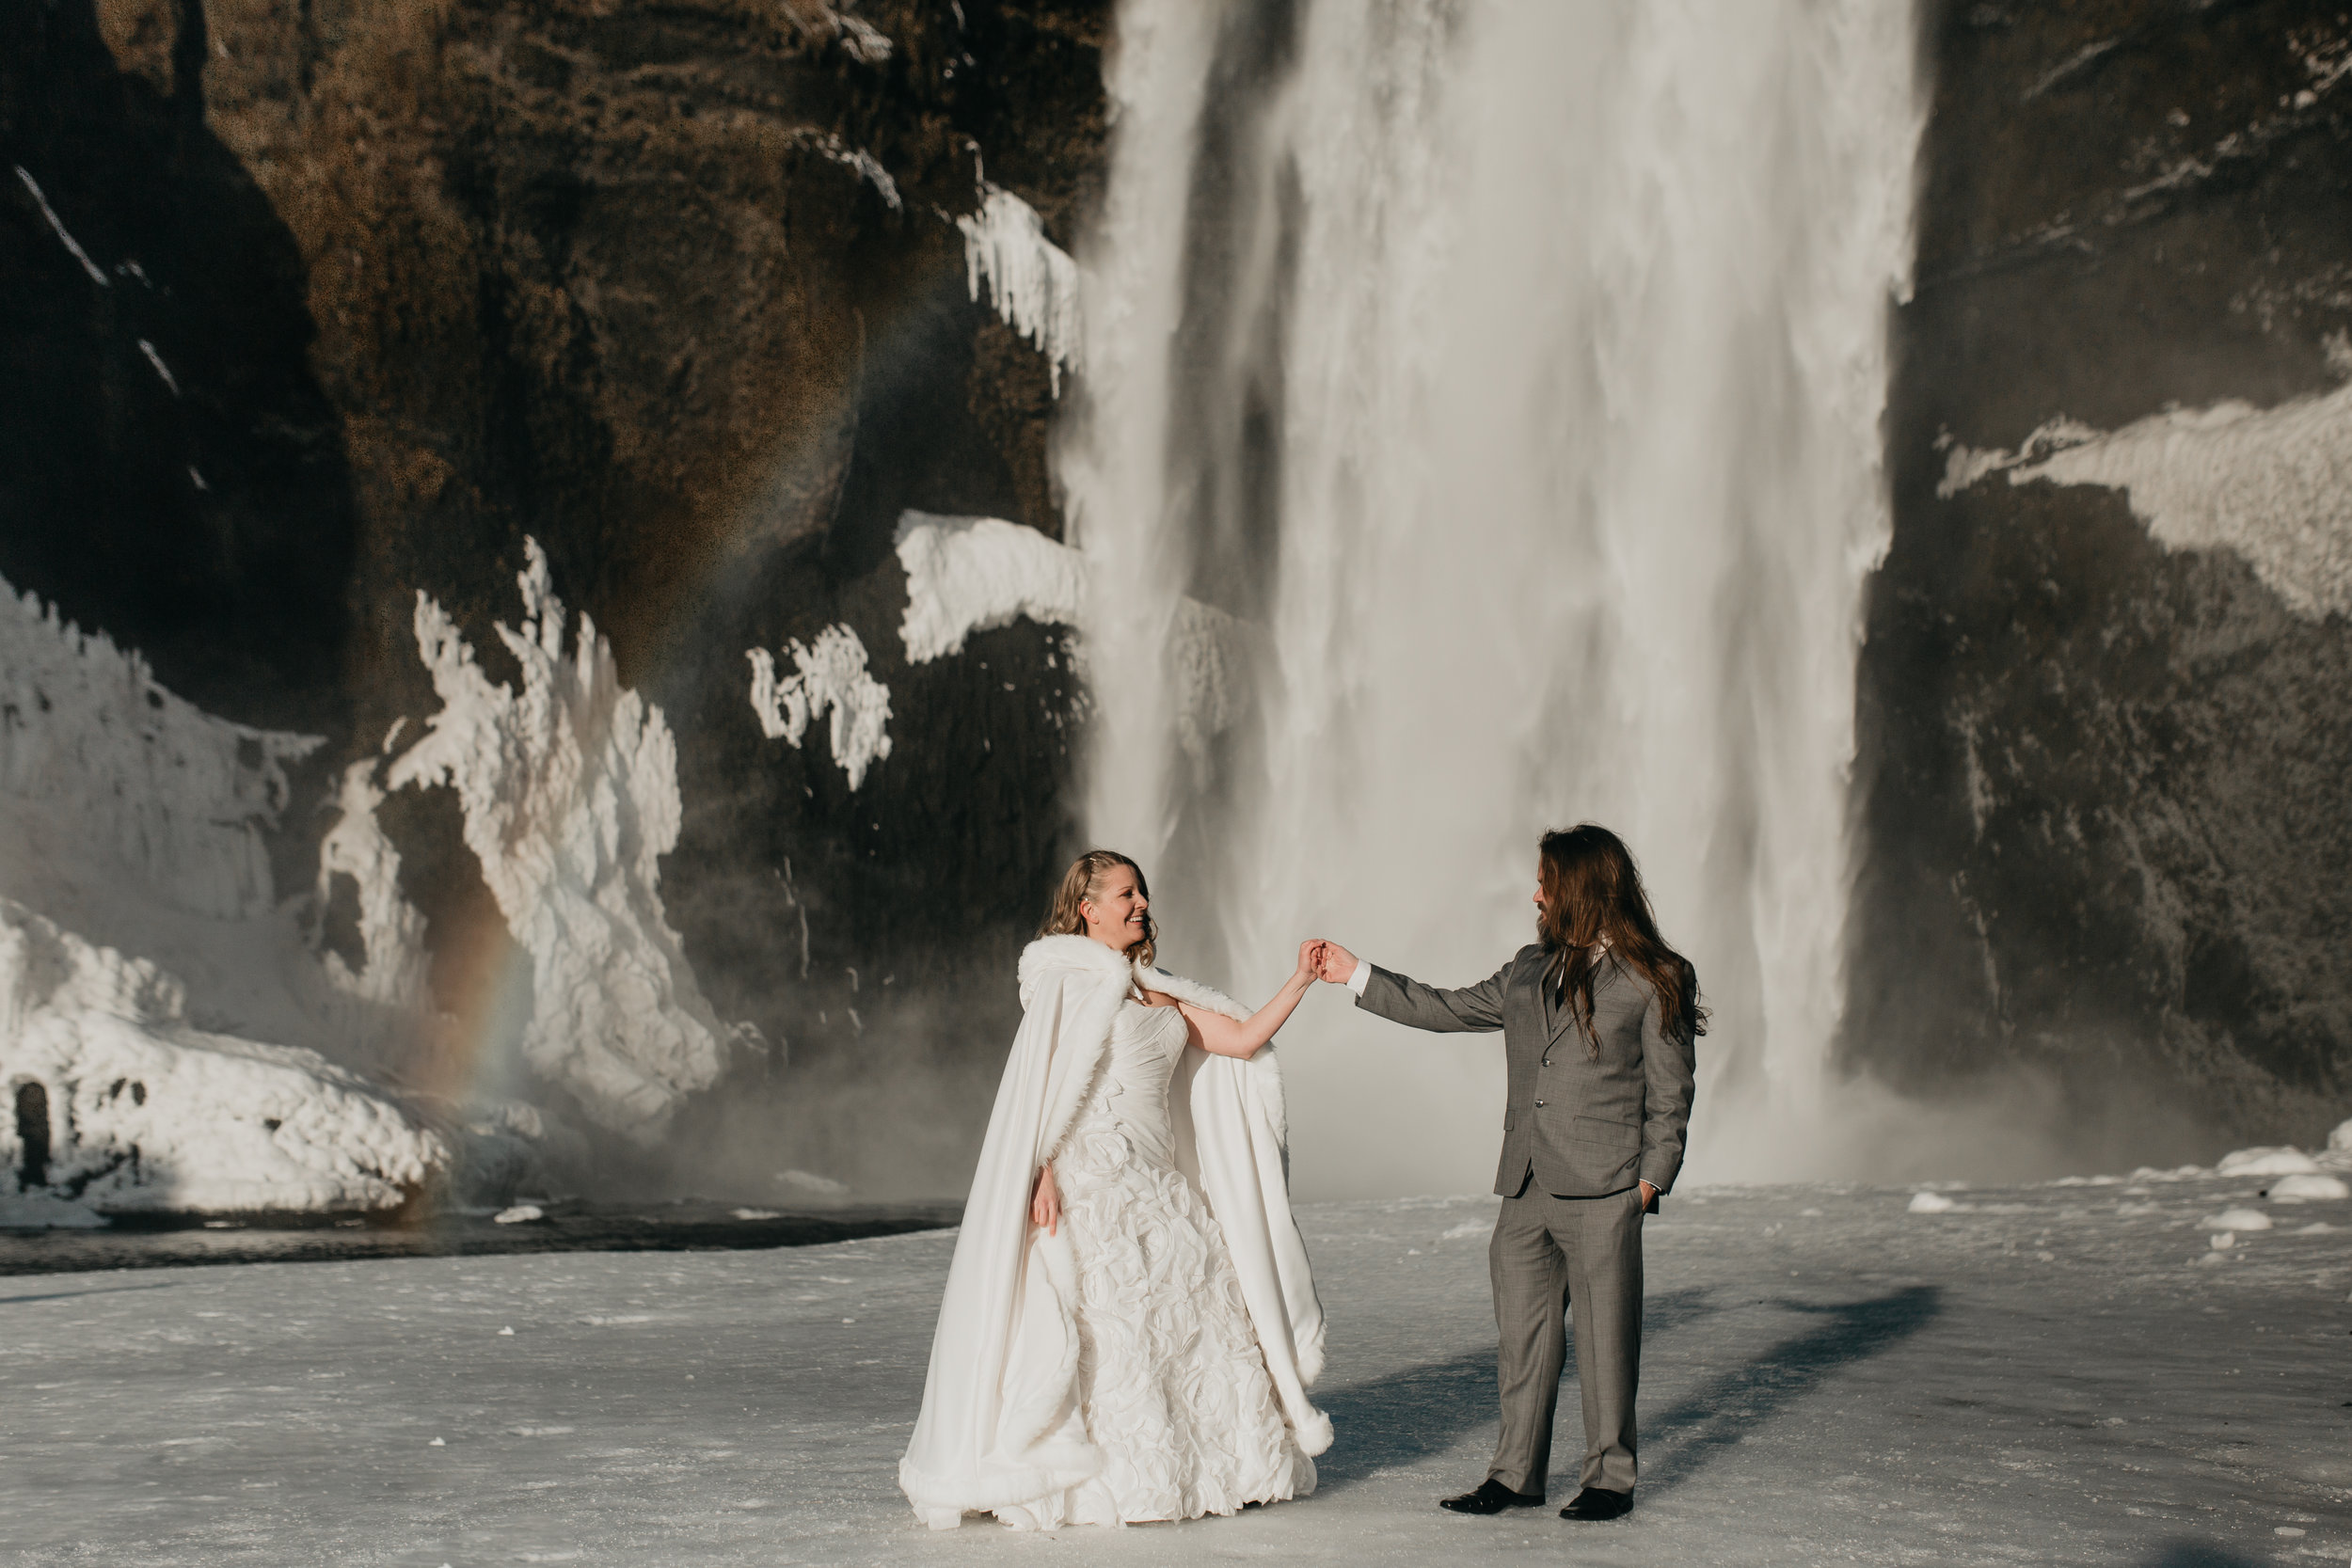 nicole-daacke-photography-iceland-winter-sunset-adventure-elopement-skogafoss-waterfall-black-sand-beach-dyrholaey-vik-iceland-intimate-wedding-black-church-elopement-photographer-11.jpg